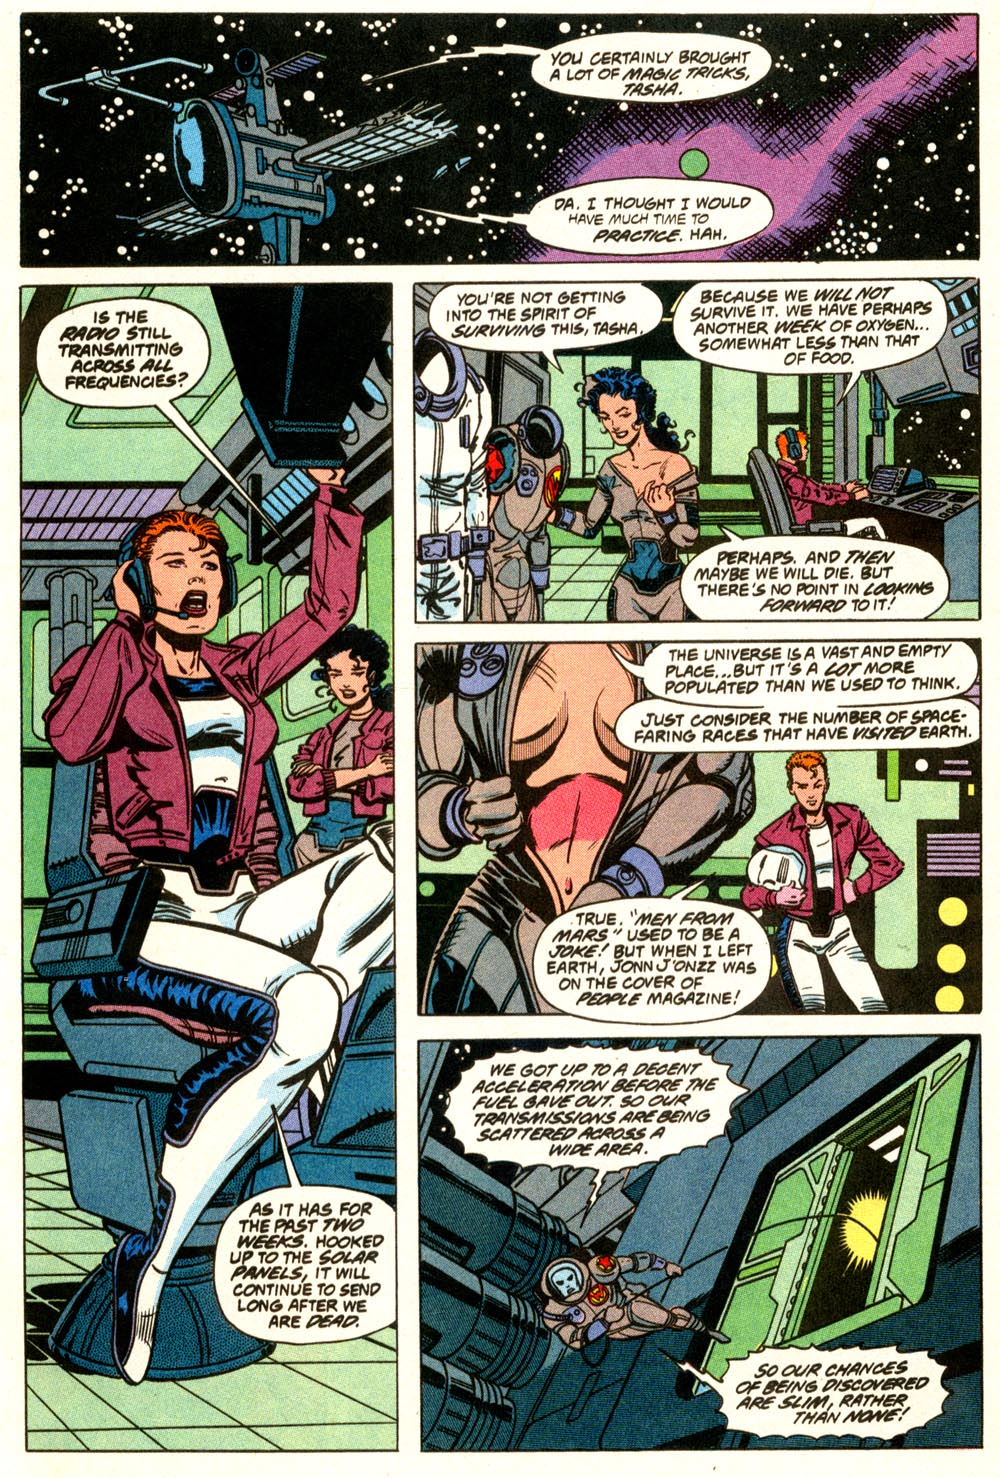 Read online Wonder Woman (1987) comic -  Issue #67 - 4